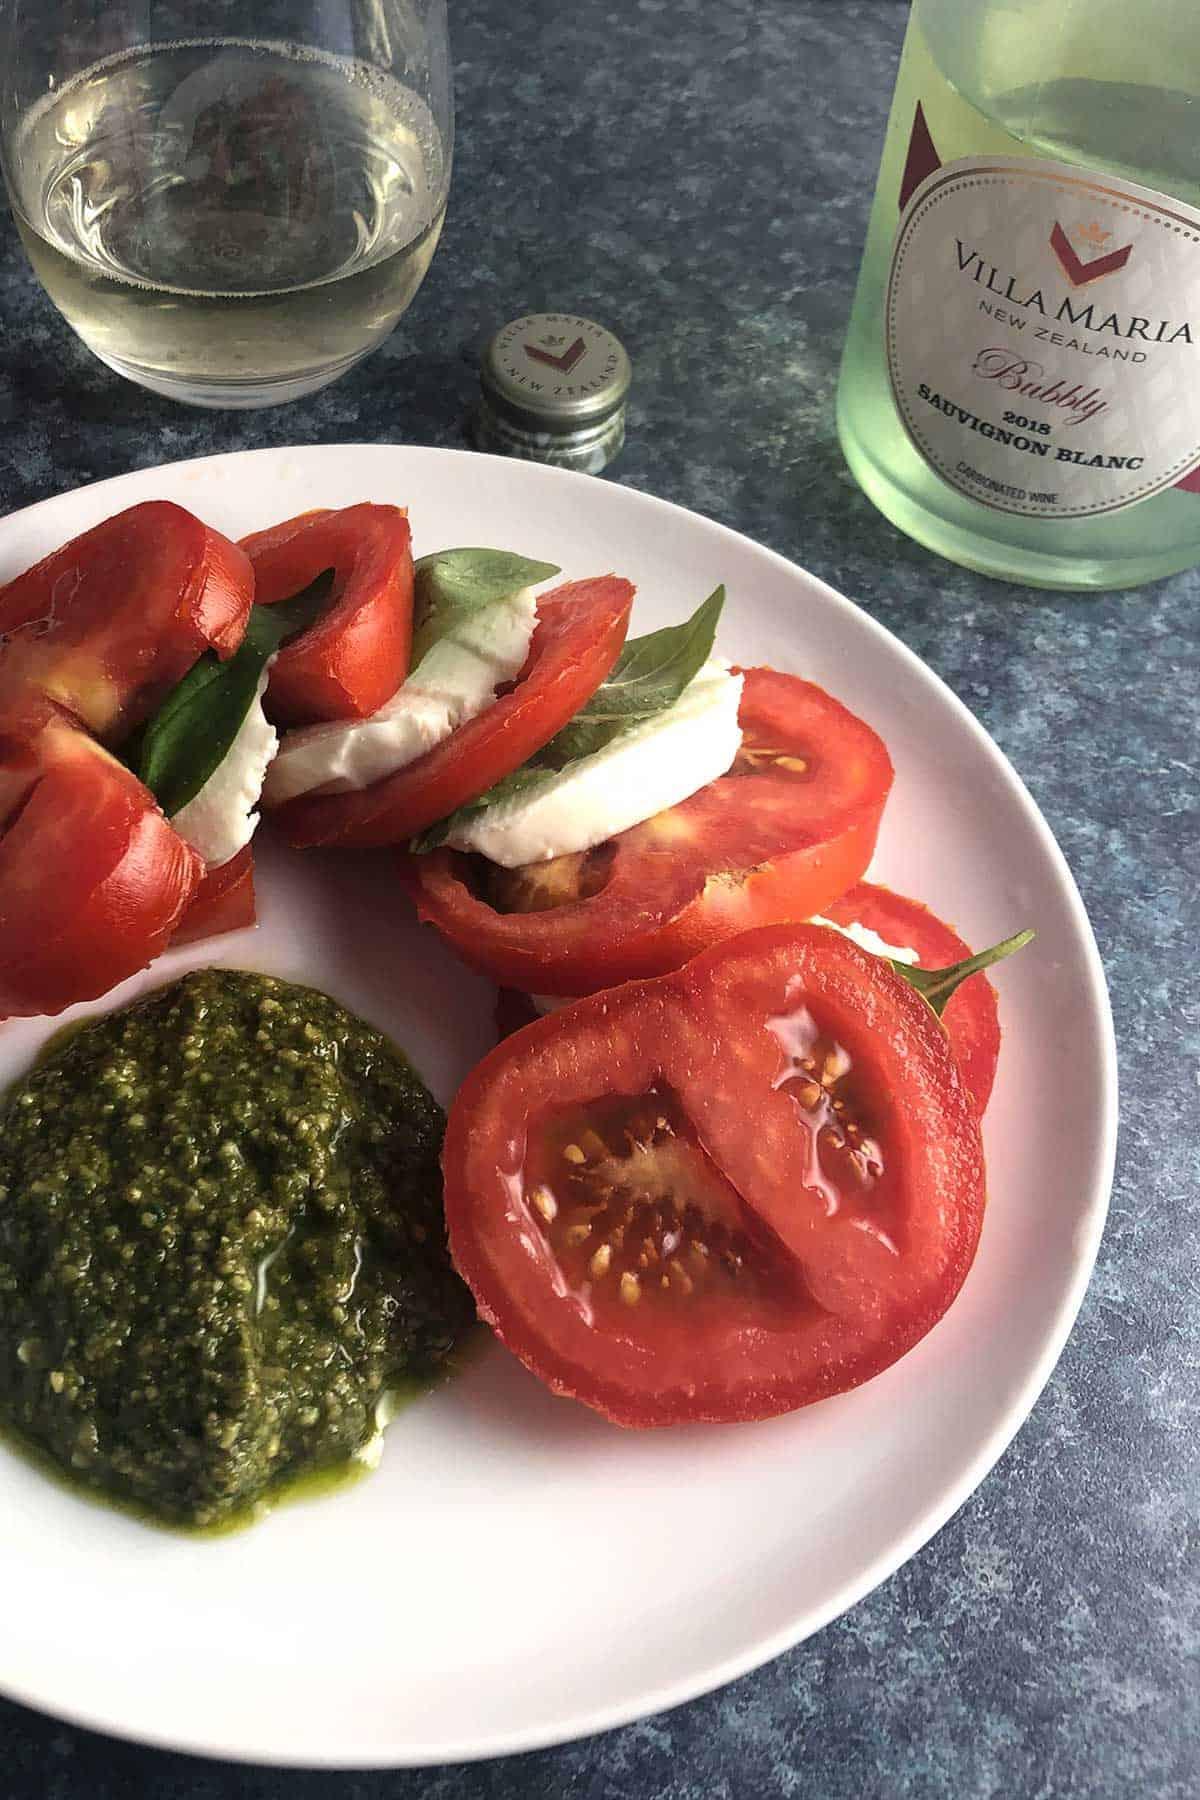 tomato caprese salad paired with a Sauvignon Blanc.